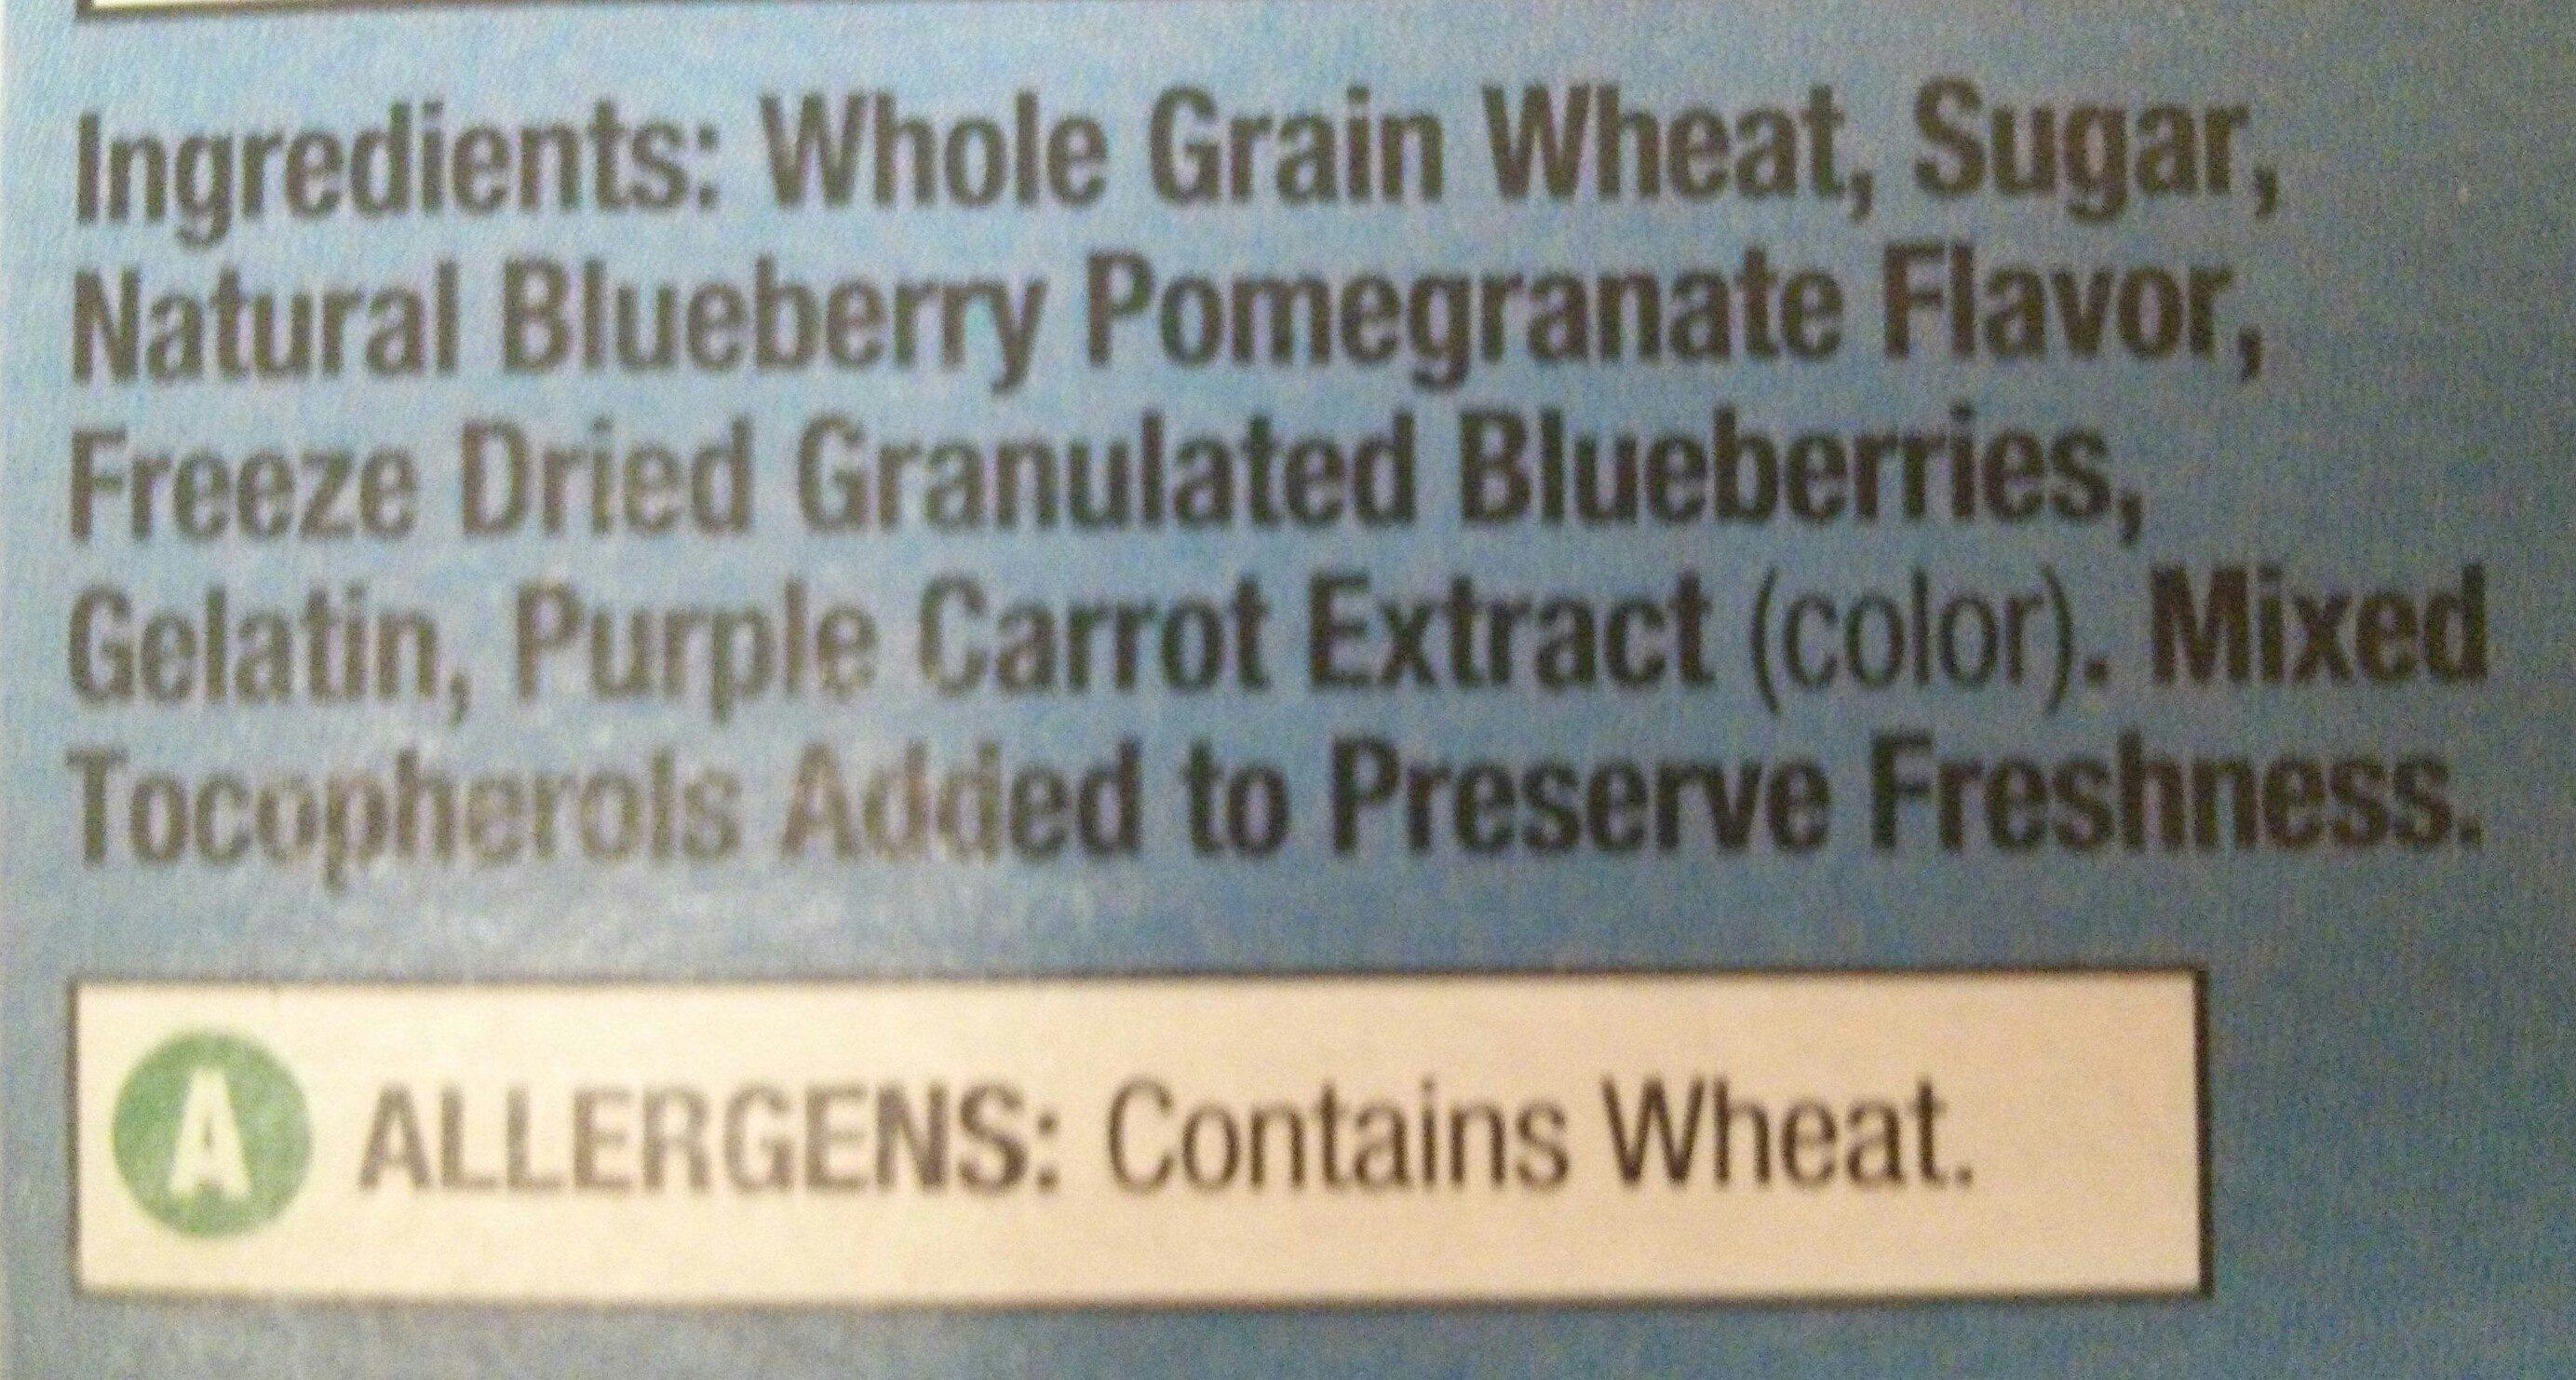 Frosted Bite-Size Blueberry Shredded Wheat - Ingredients - en